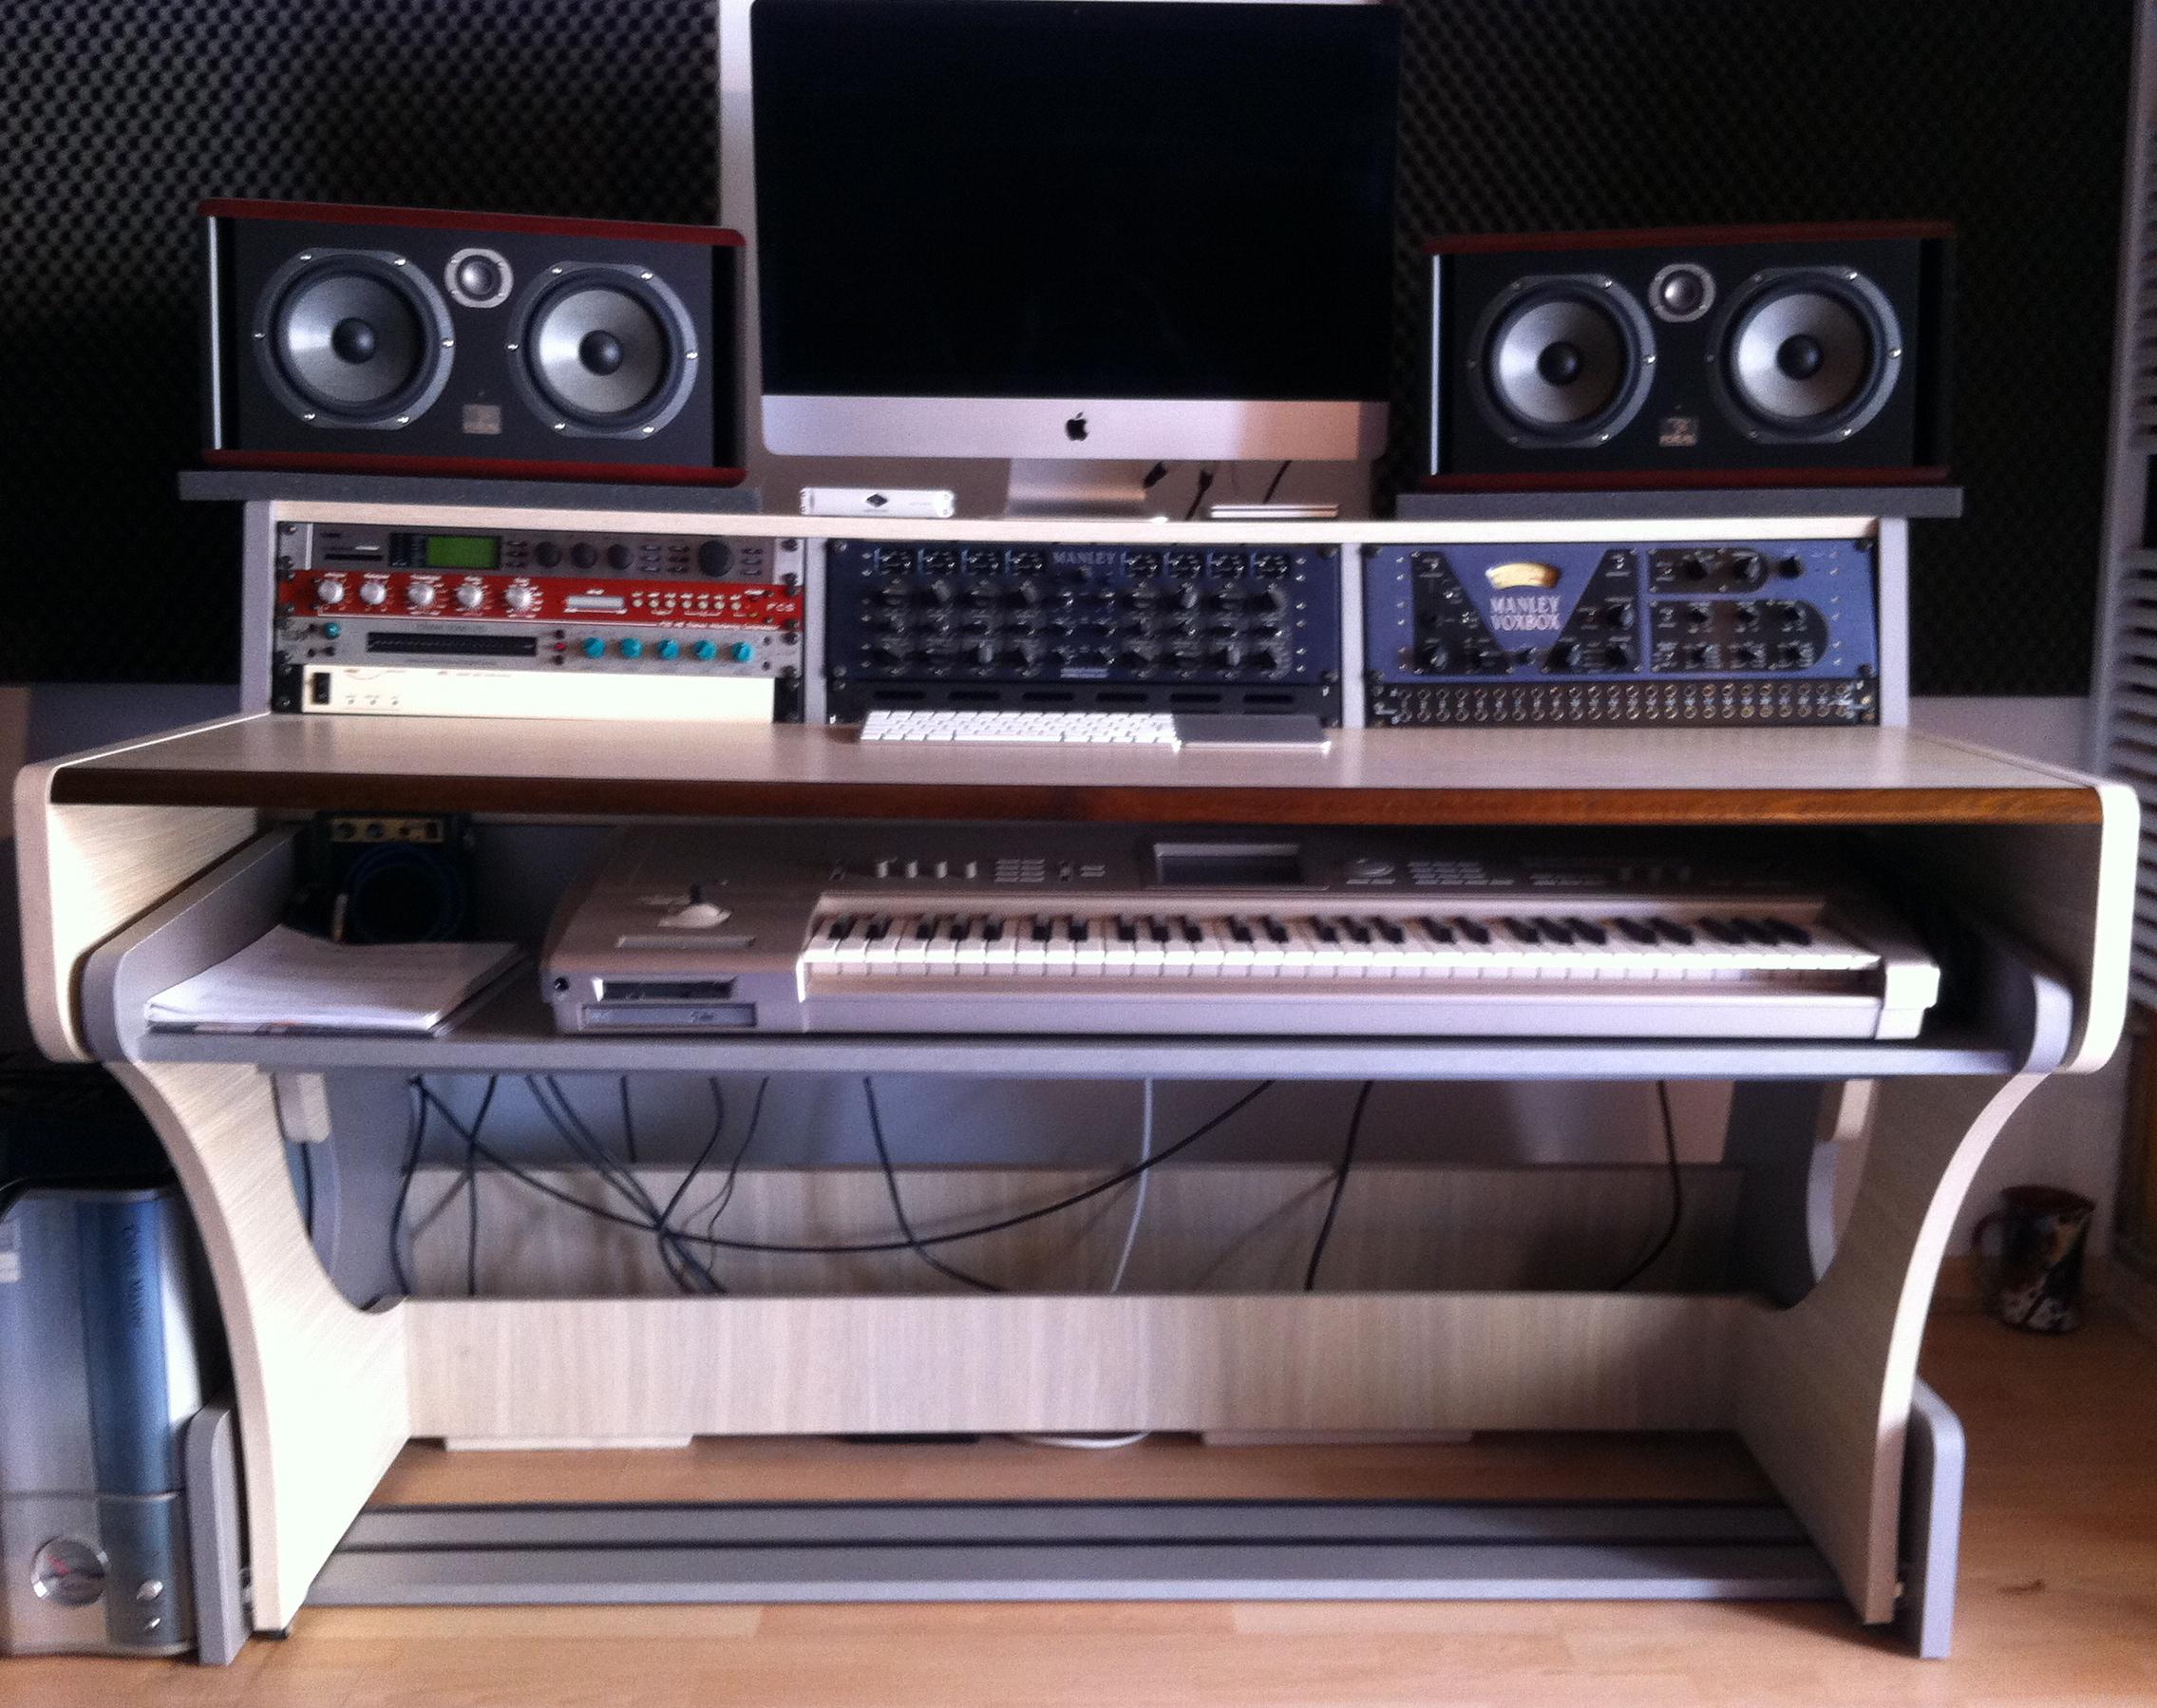 zaor-miza-88-xl-bleached-oak-863940 Studio Furniture Workstation Home on home studio setup furniture, home studio furniture desk, home recording workstation,